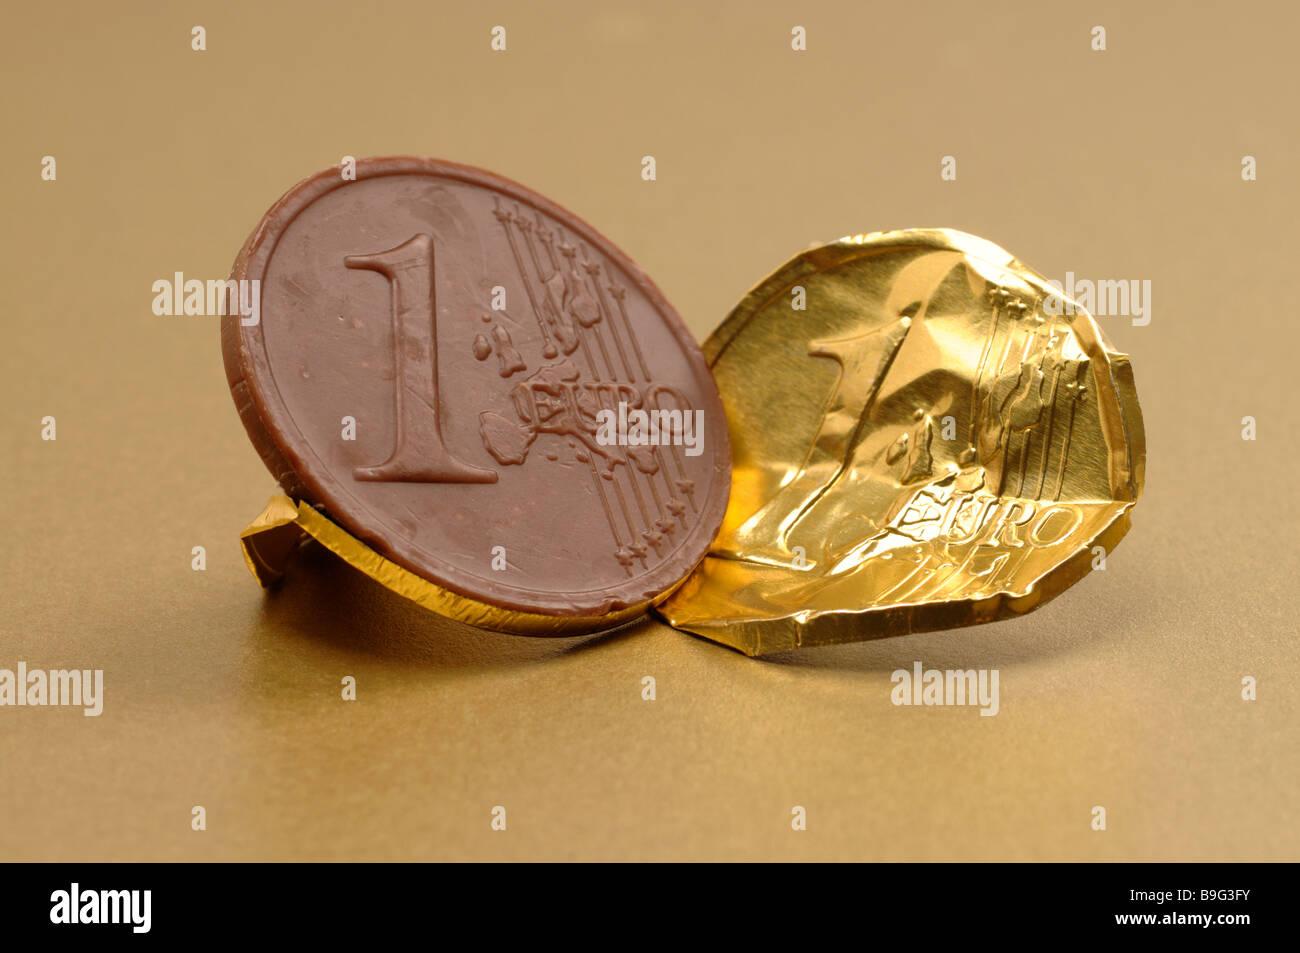 Chocolate Euro coin - Stock Image